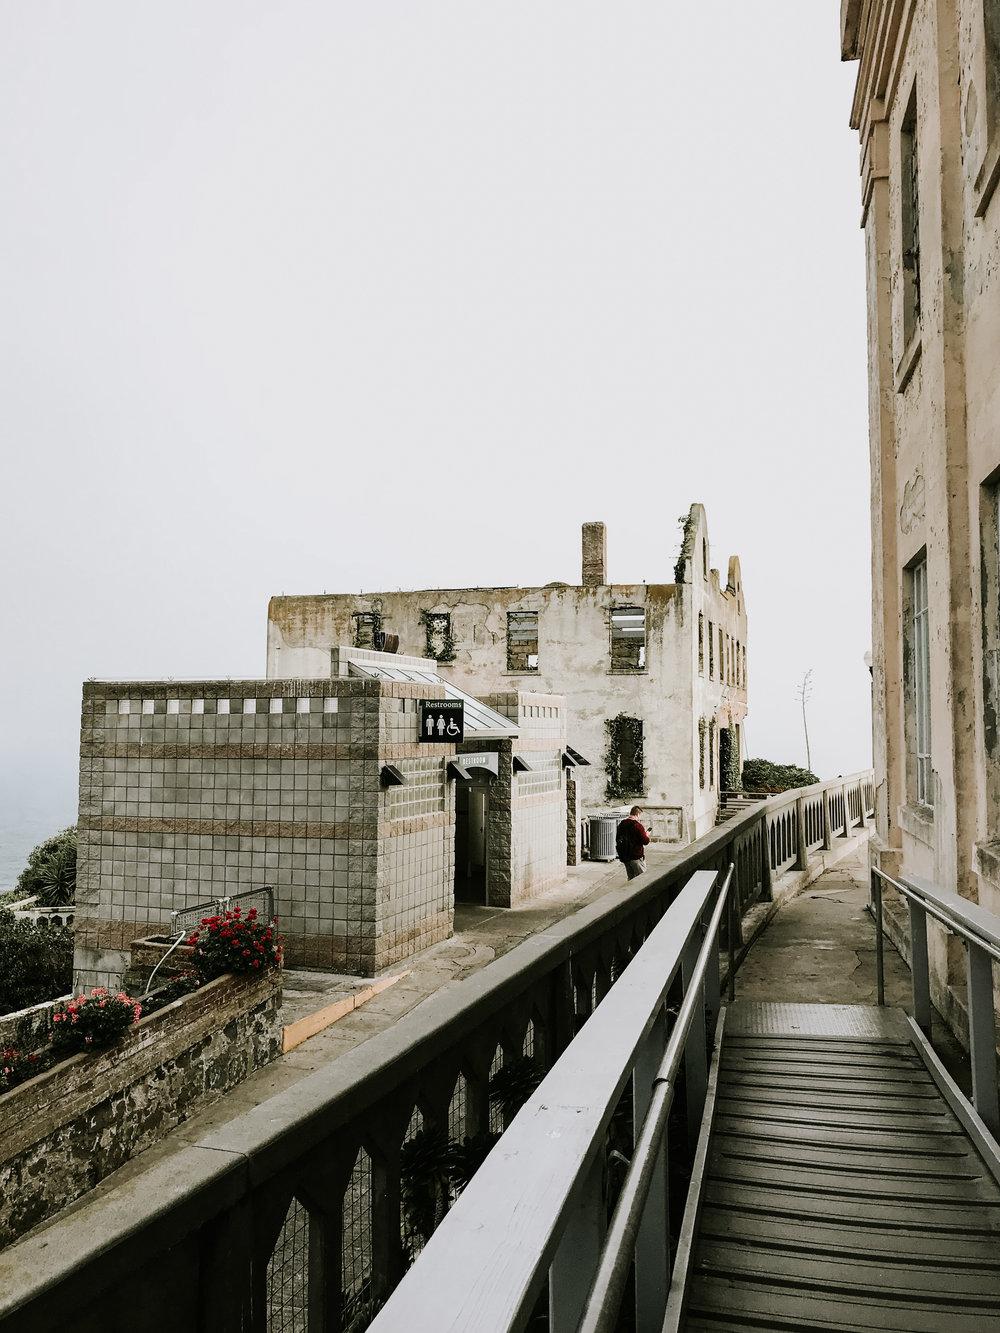 our trip to San Francisco - Alcatraz island and prison on the San Francisco bay